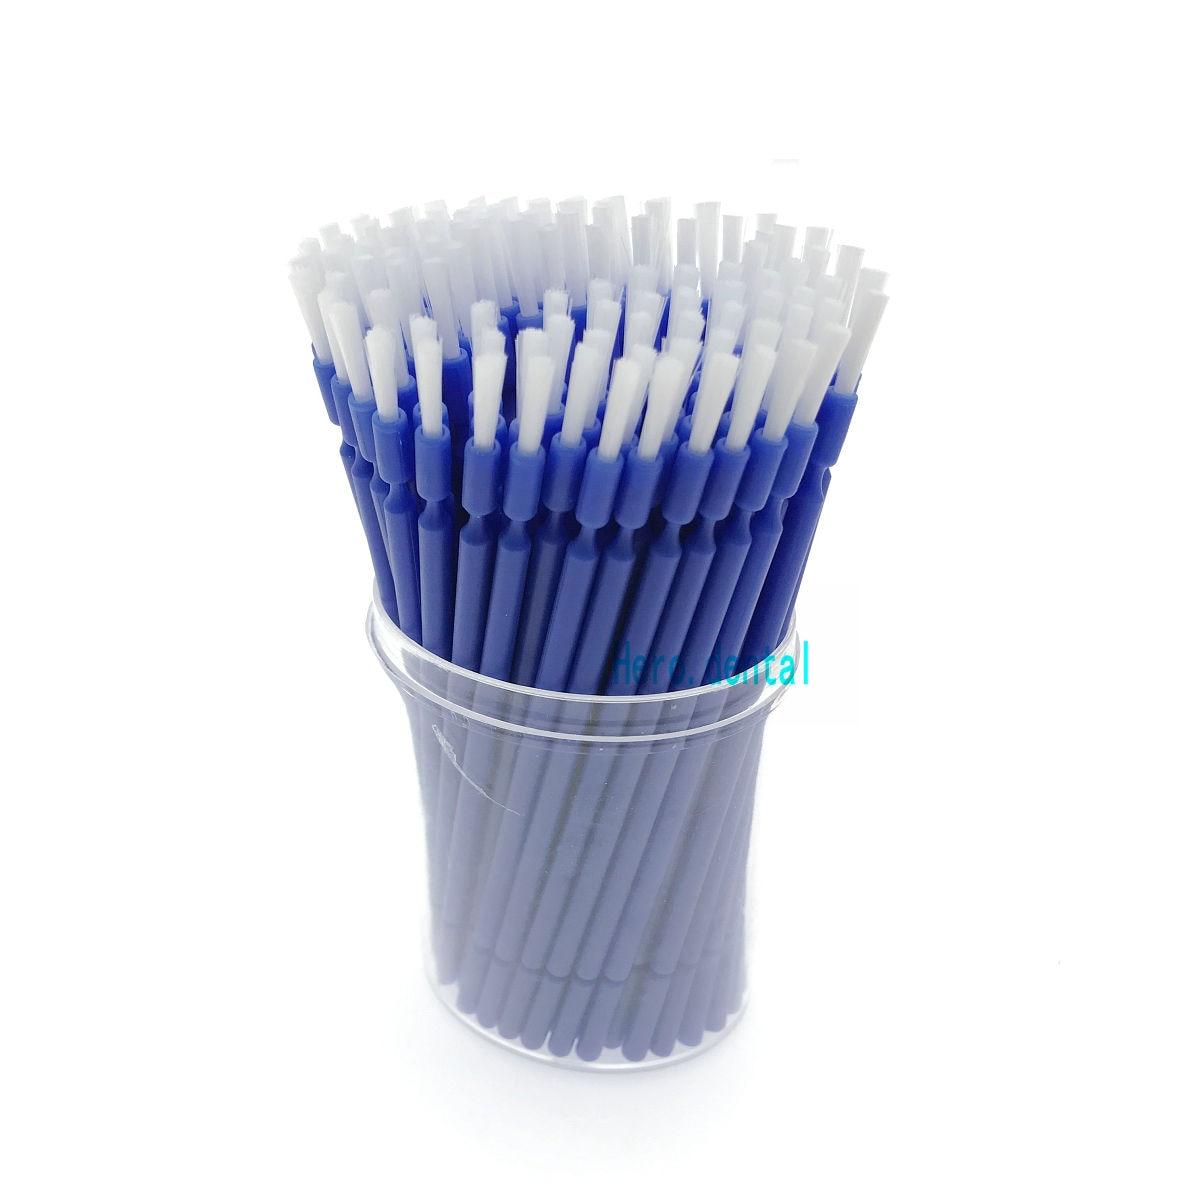 200pcs Dental Lab Long Disposable Micro Applicators Brushes Dental Brush